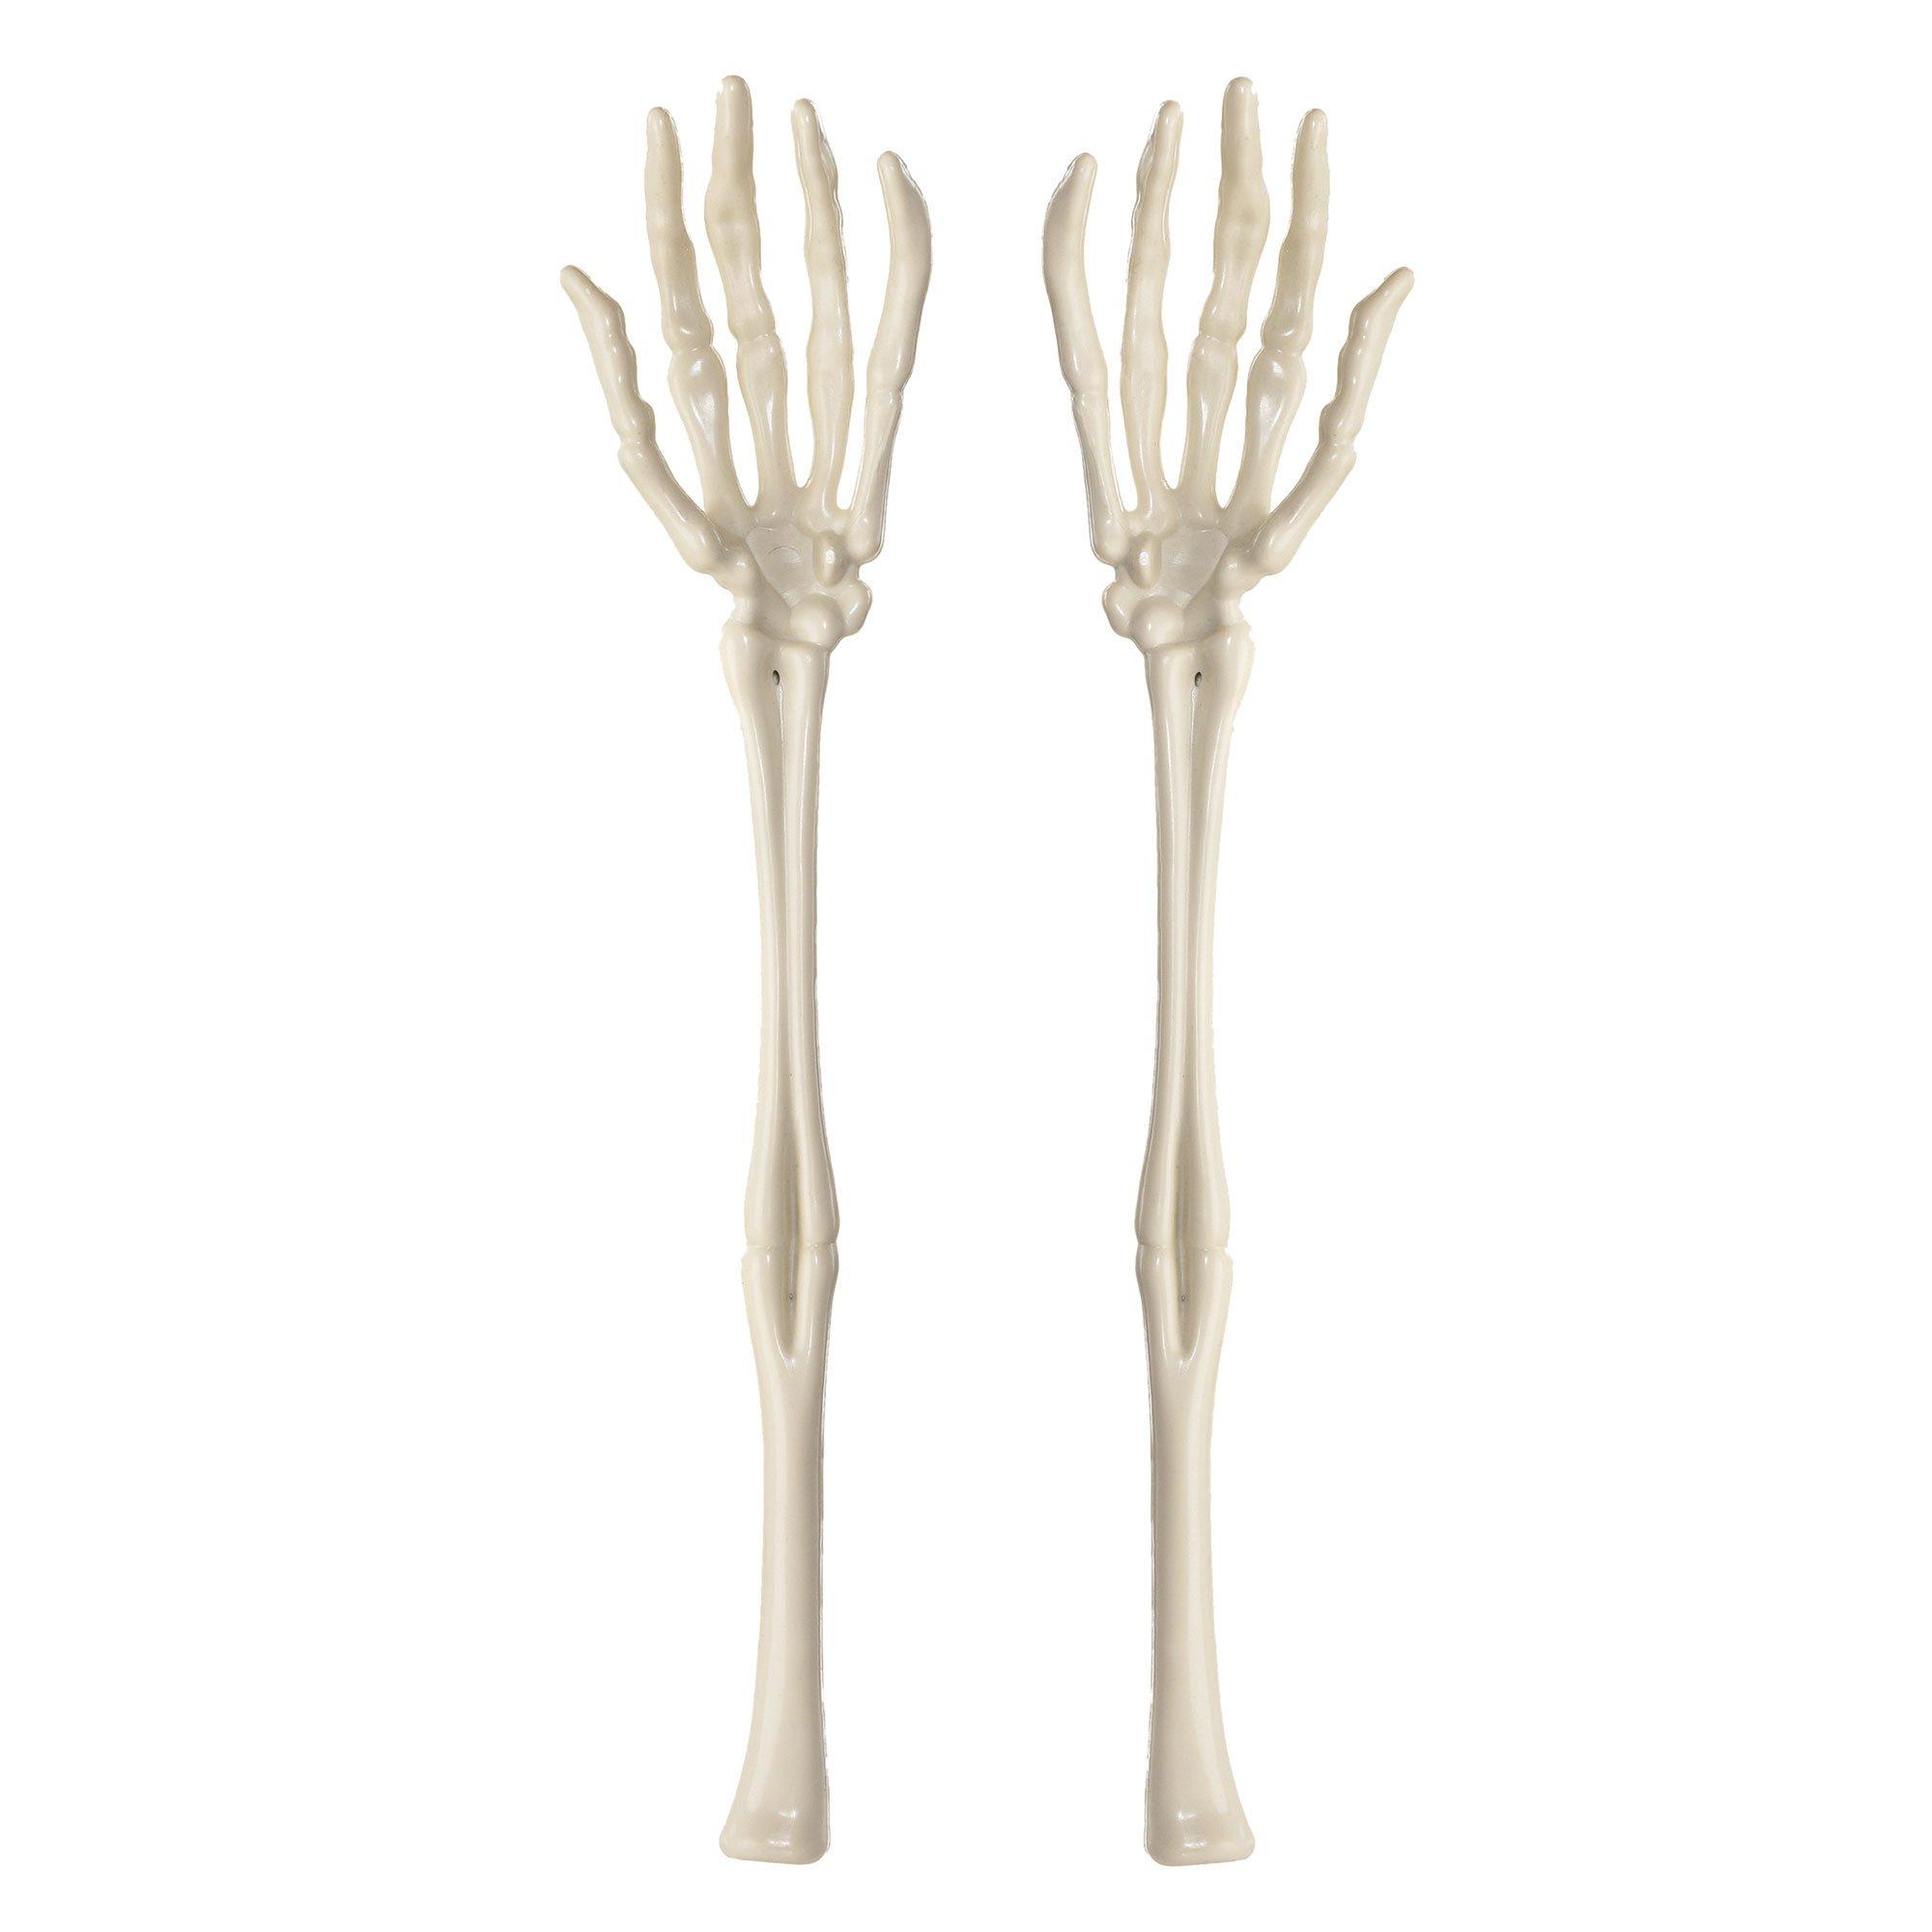 Boneyard Skeleton Hands Serving Utensils